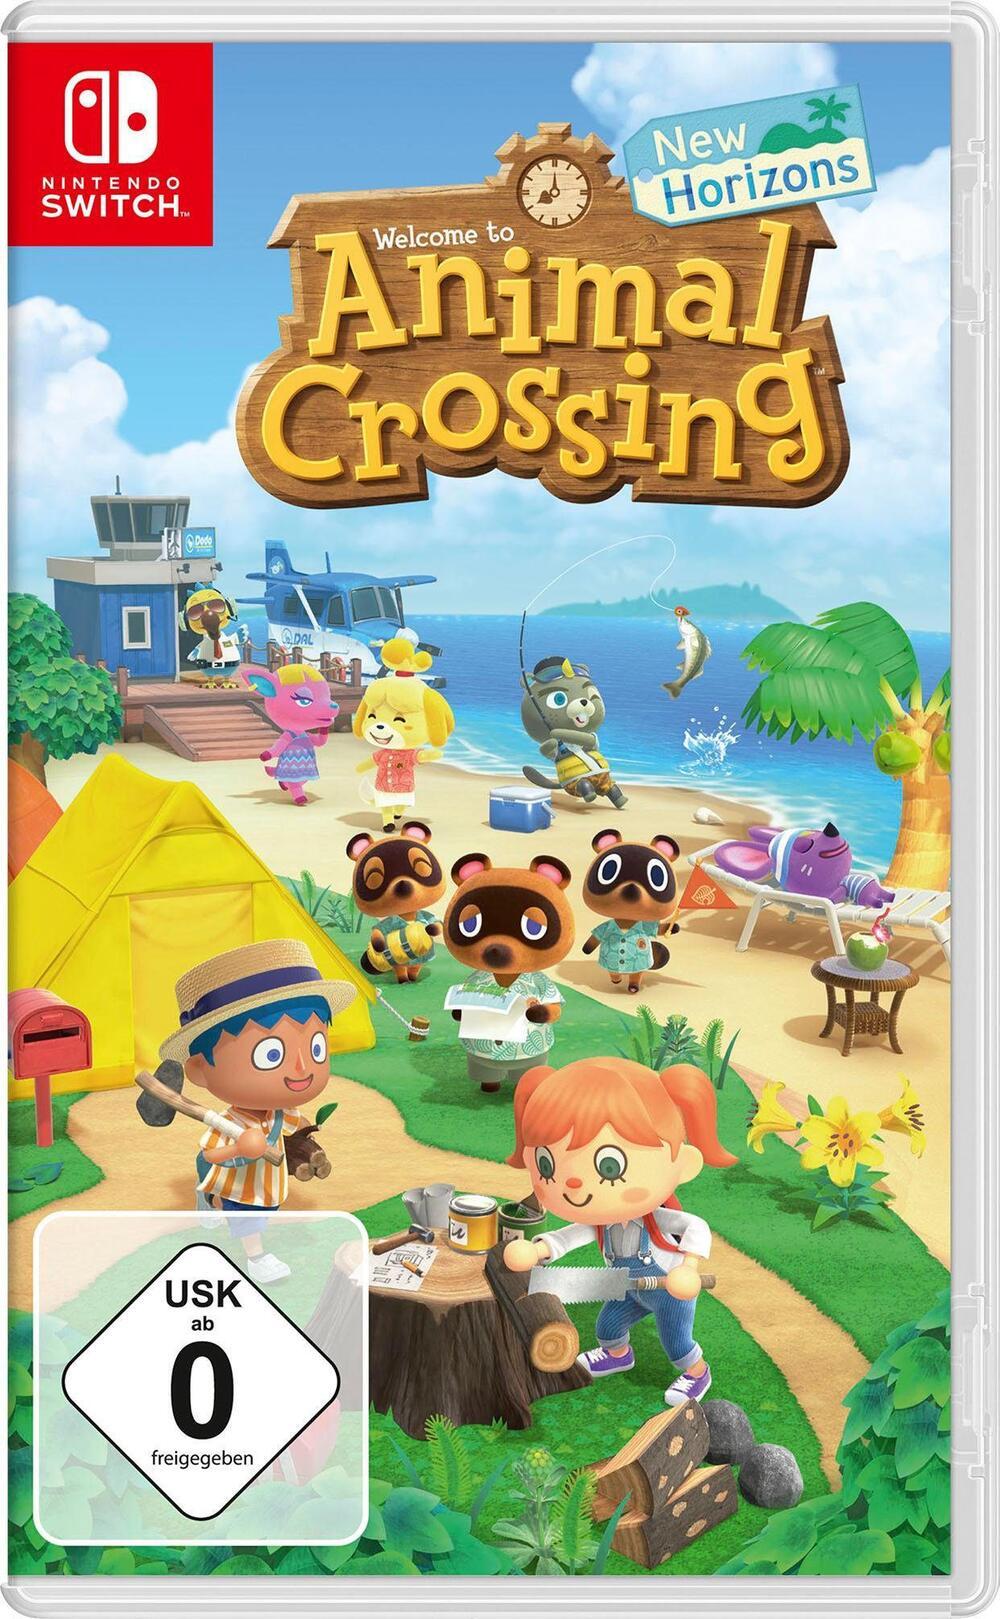 spiele, switch, nintendo switch, pokemon, games, videospiele, animal crossing, super mario, kinder